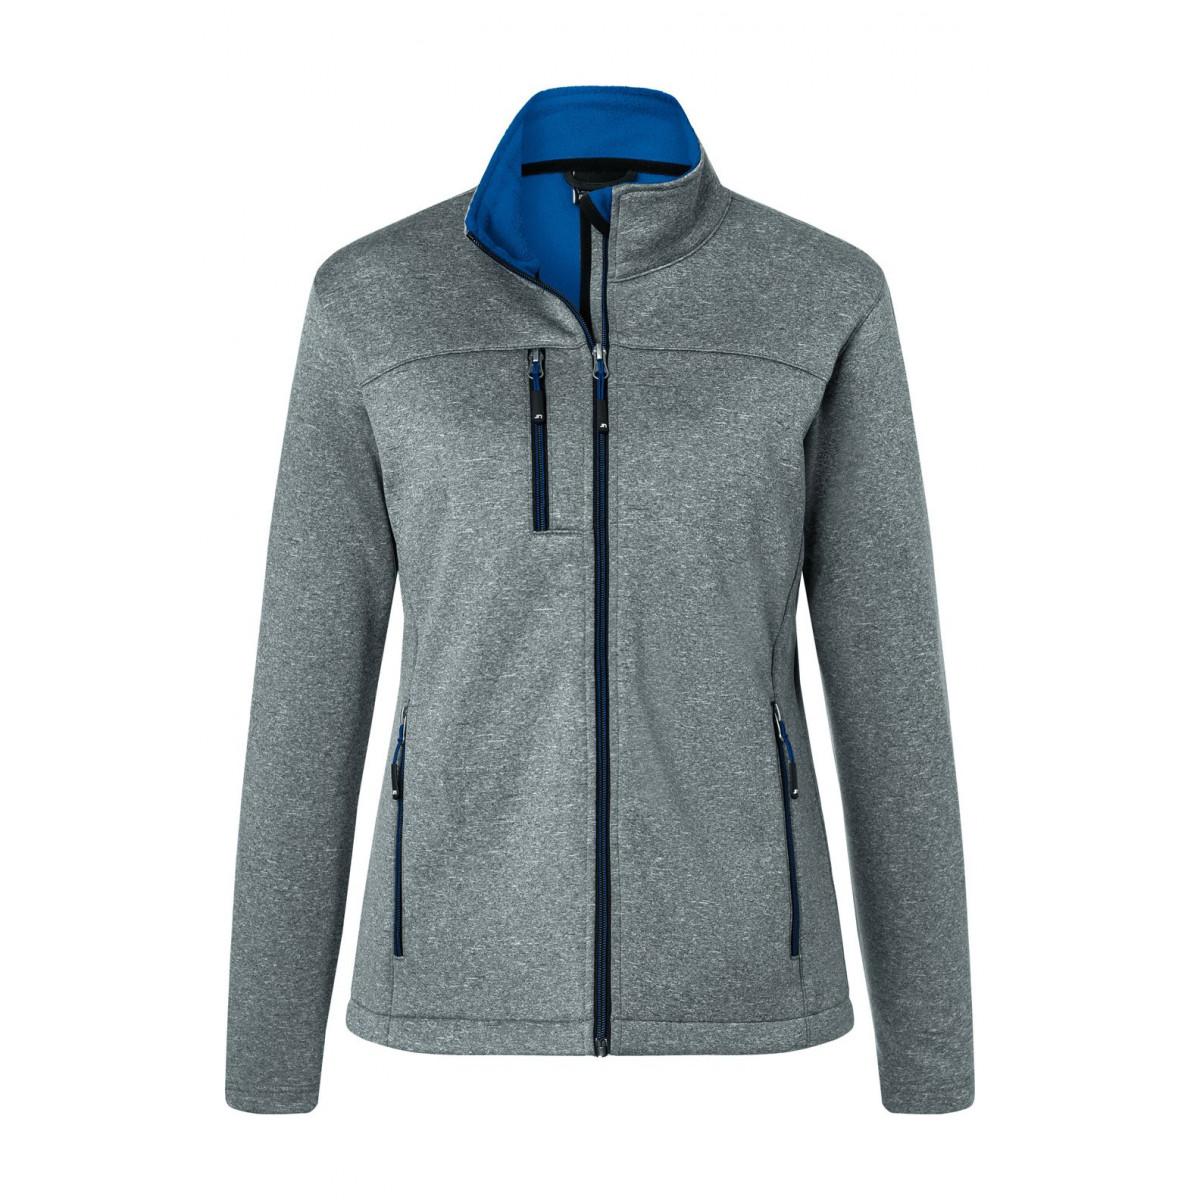 Куртка женская JN1147 Ladies Softshell Jacket - Темно-серый меланж/Ярко-синий